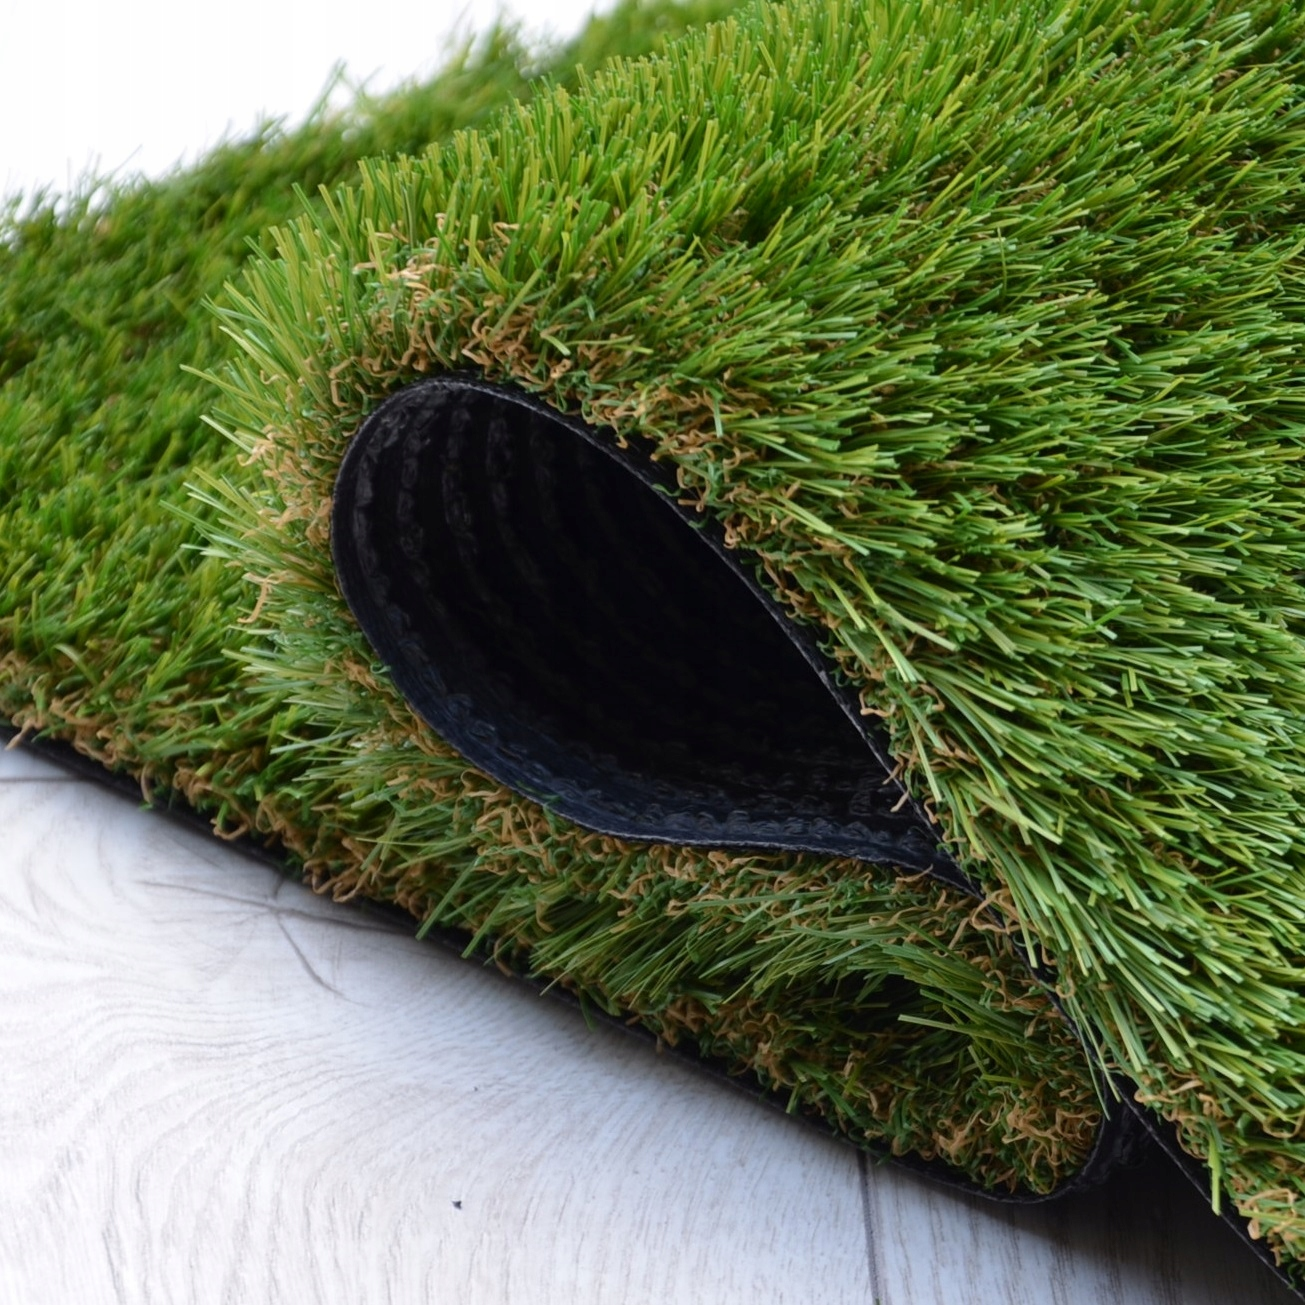 Koberec Umelá tráva Highlands| 37 mm| osvedčenie| 200x350 cm